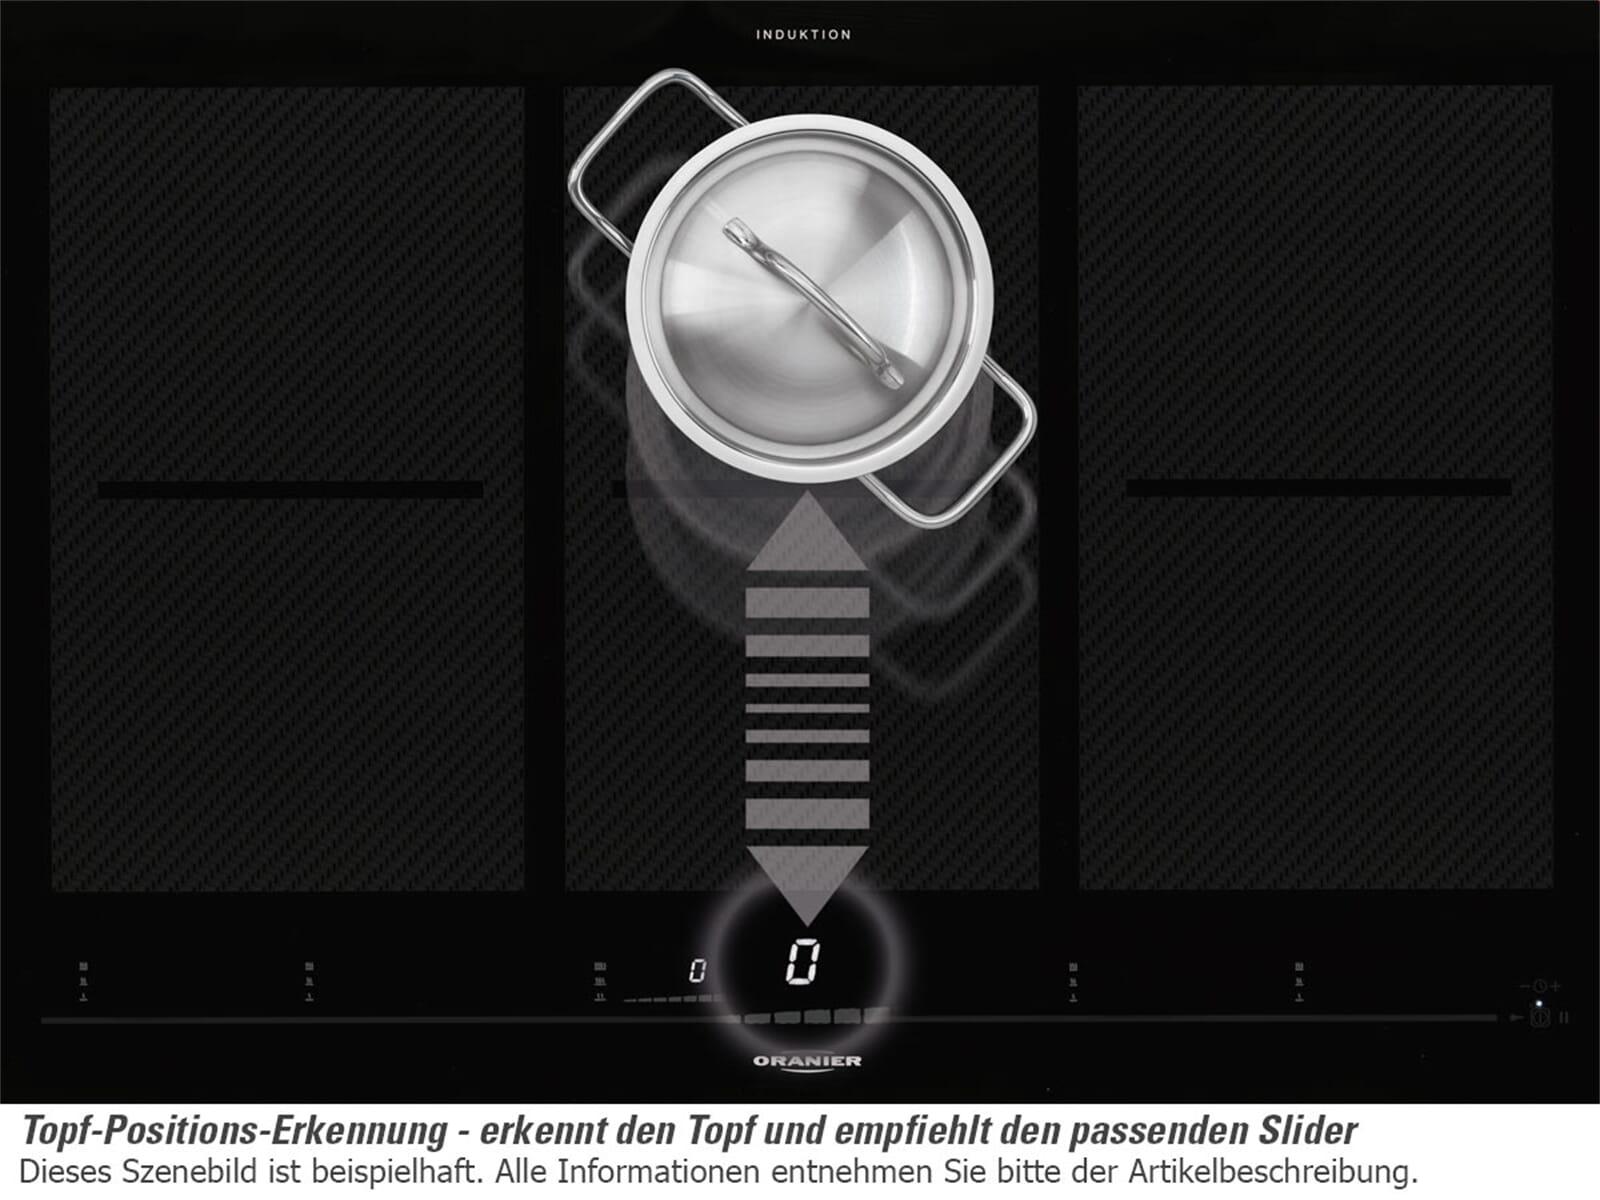 Oranier FLI 2090 SL+ - 2090 11 Induktionskochfeld autark